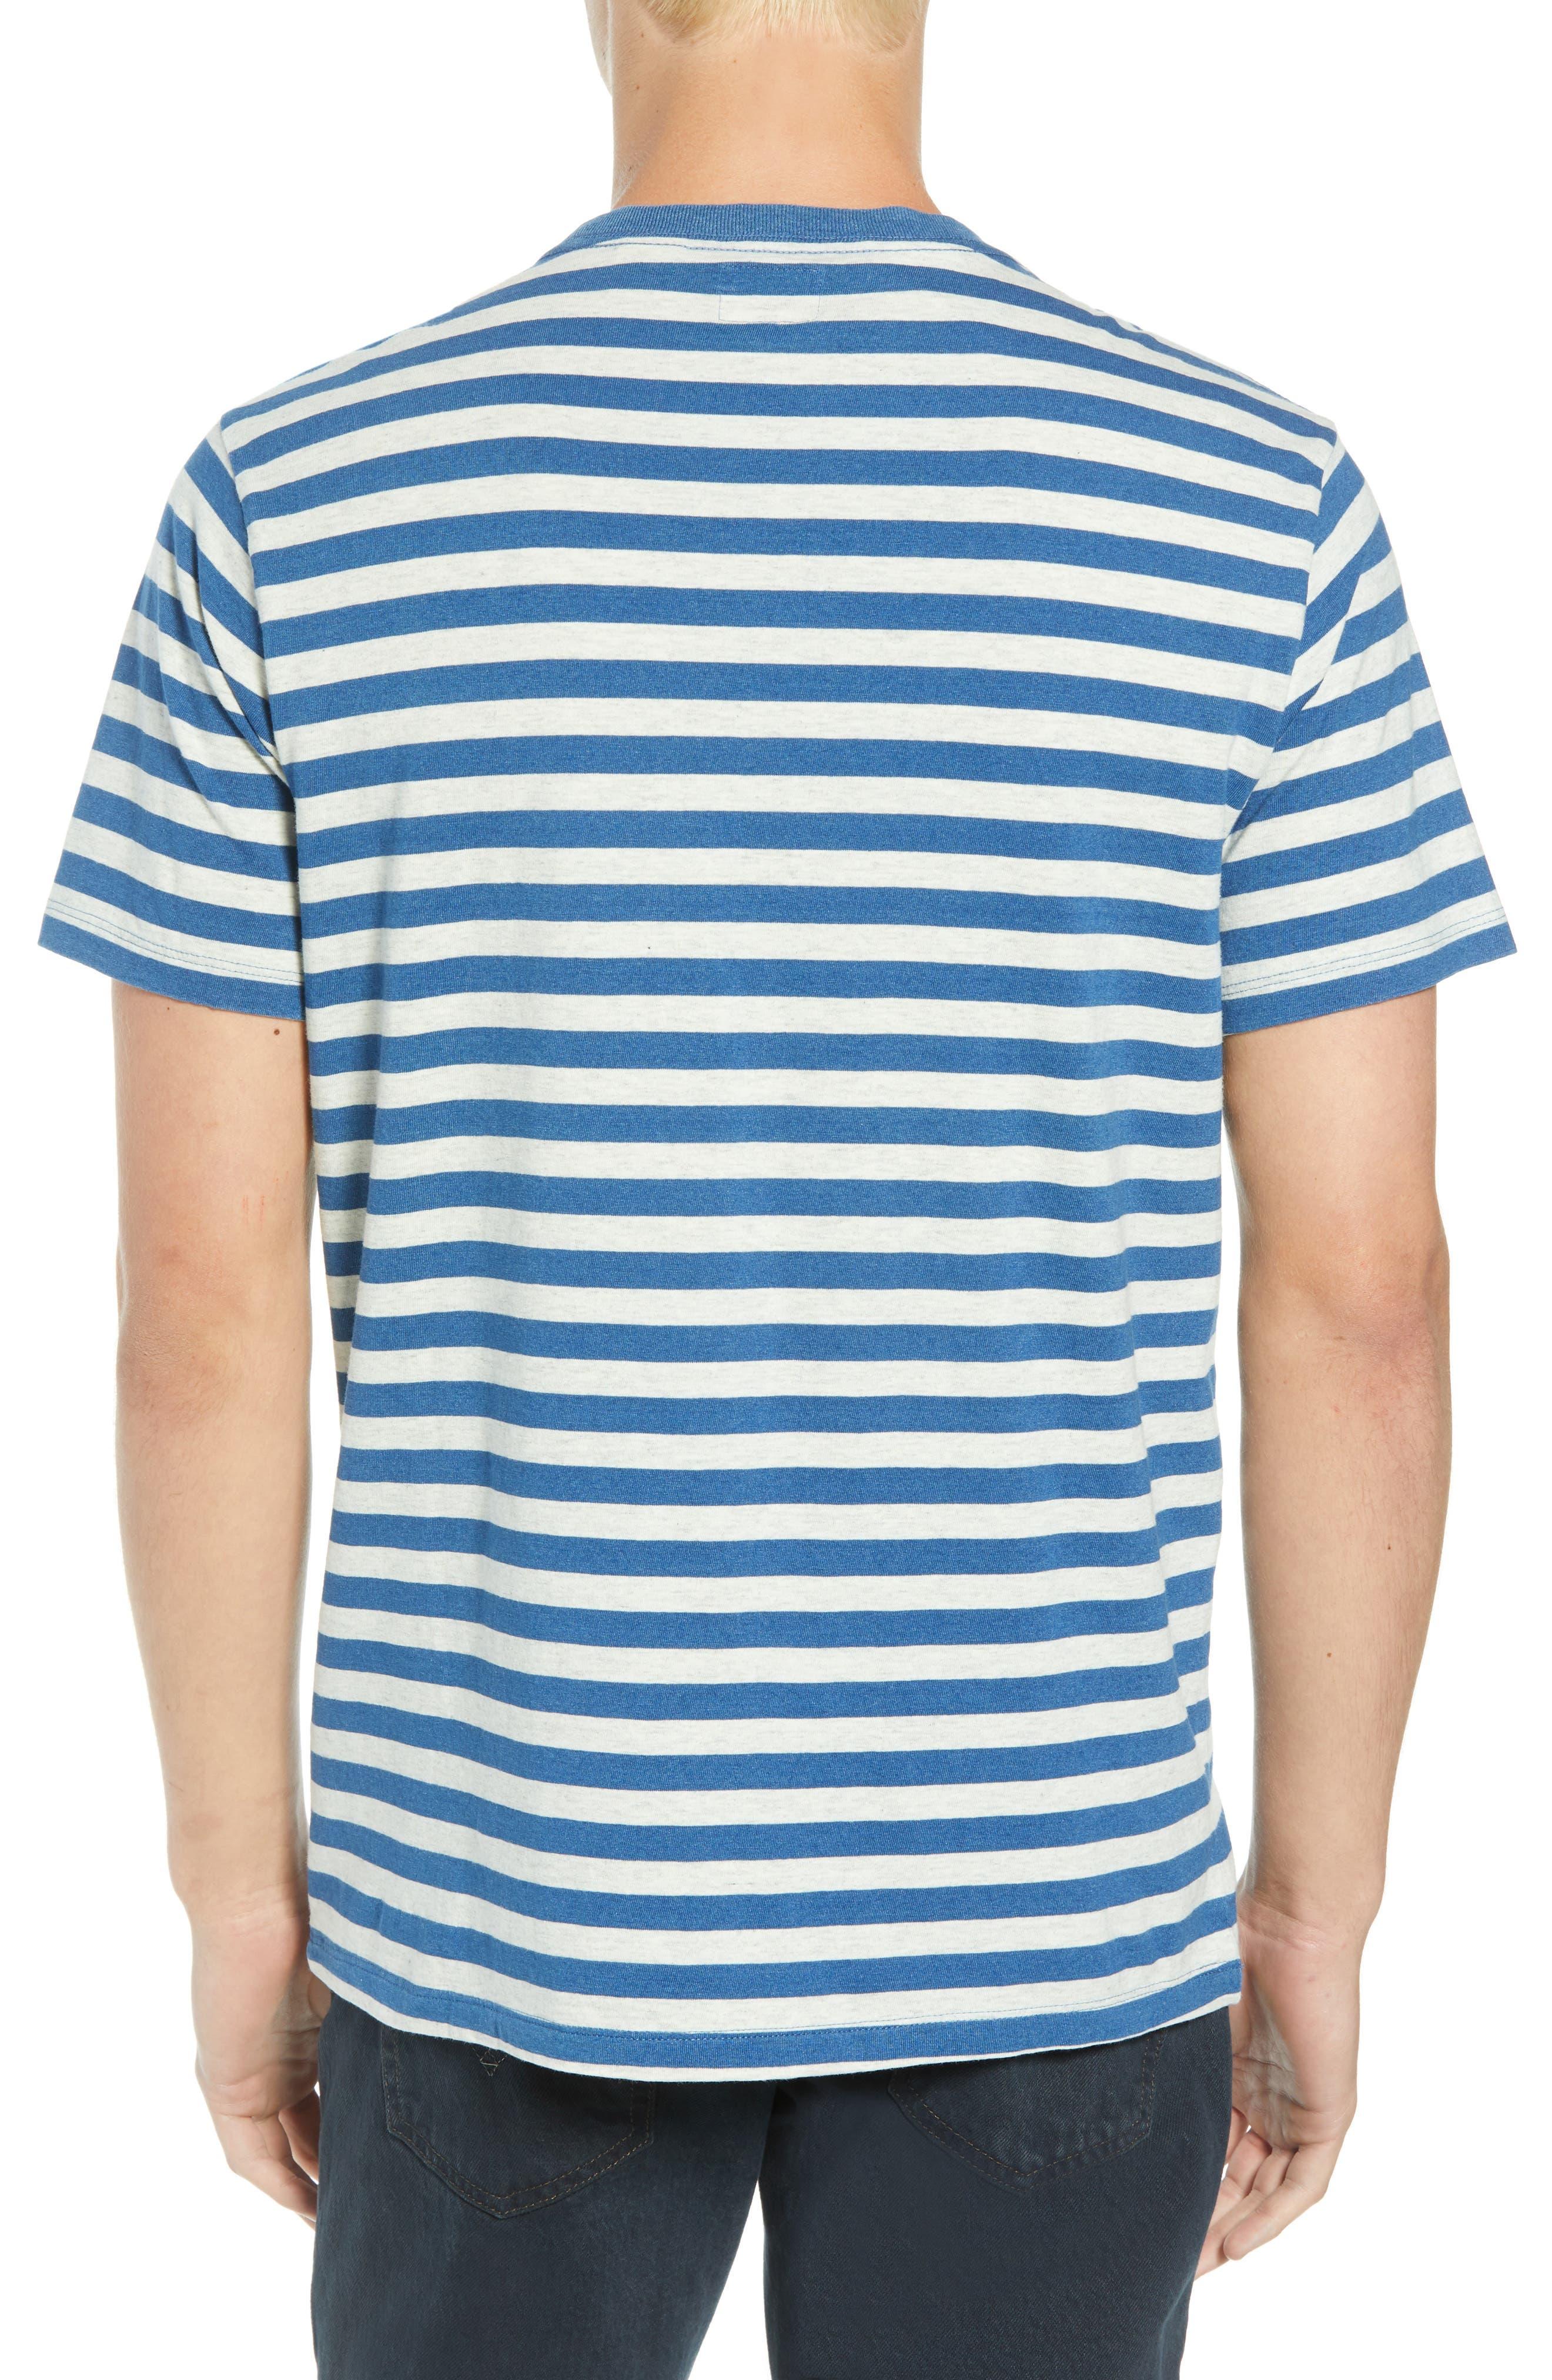 Sunset Stripe Pocket T-Shirt,                             Alternate thumbnail 2, color,                             CREAM HALF INCH STRIPE